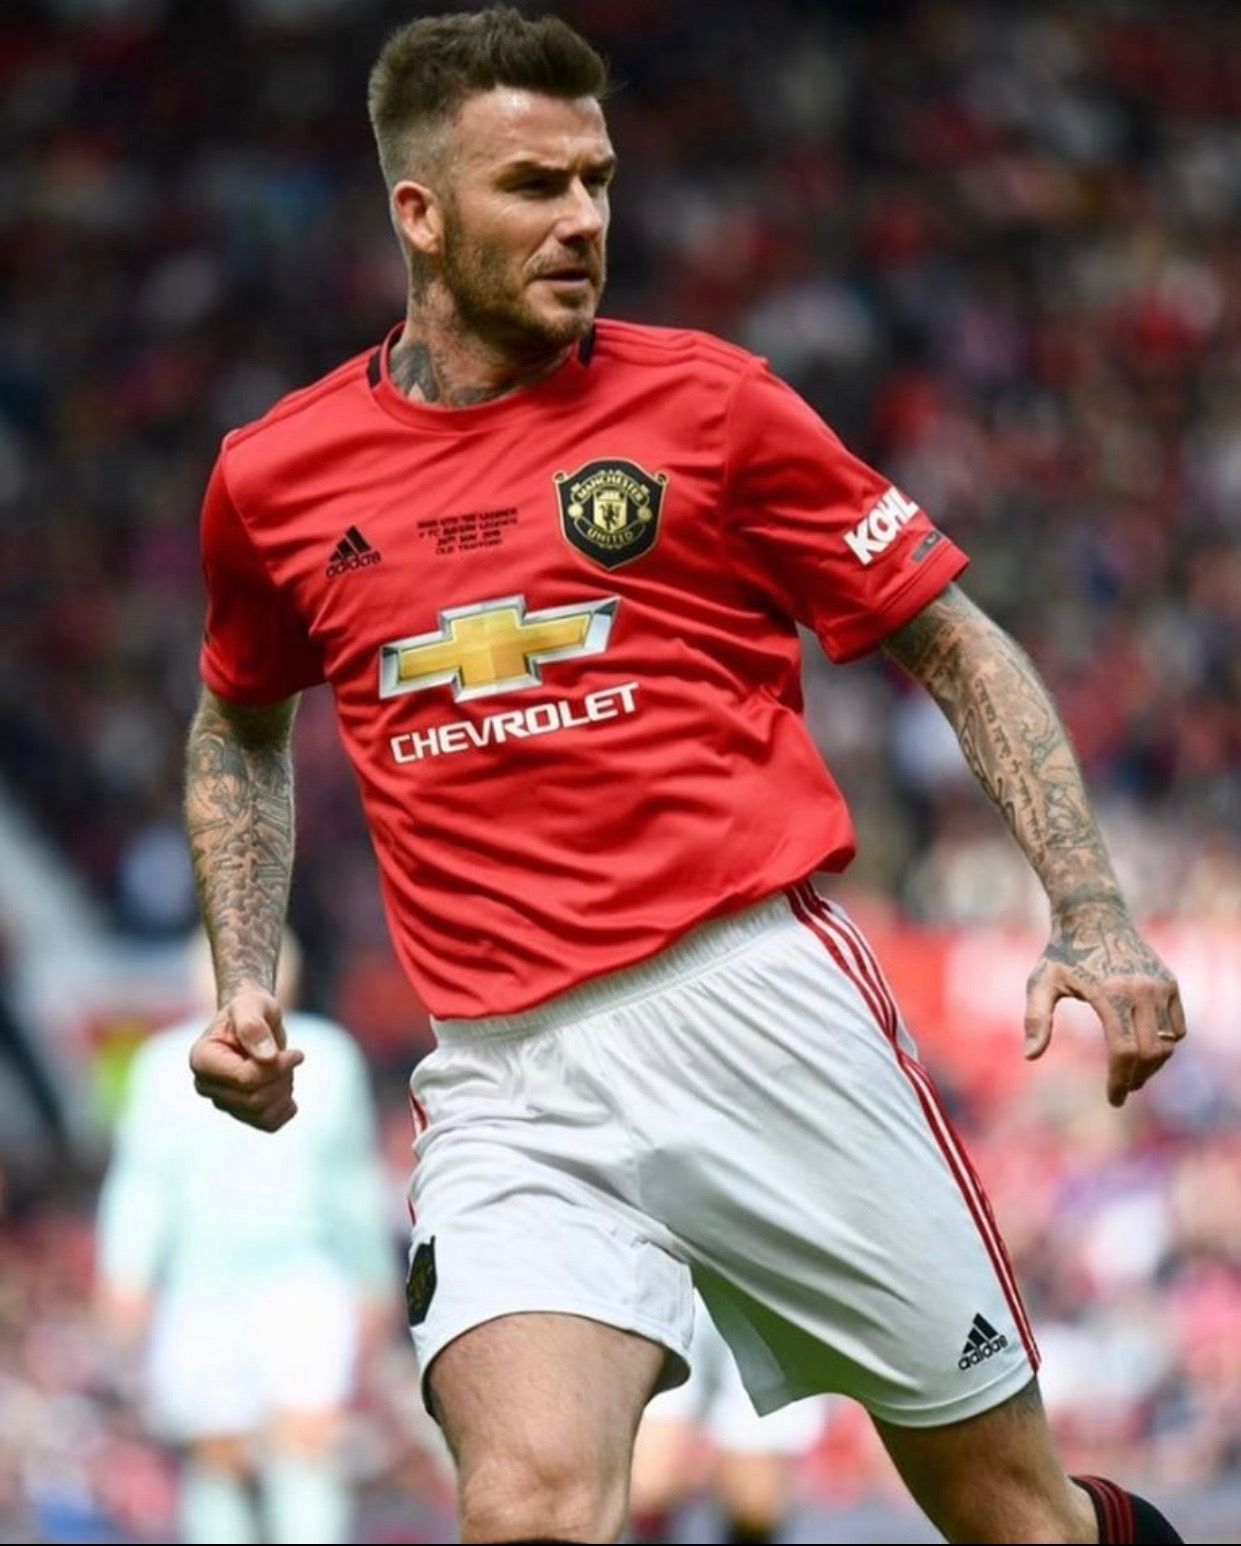 Pin By Narendran Thinagaran On Football David Beckham Manchester United Players Manchester United Football Club